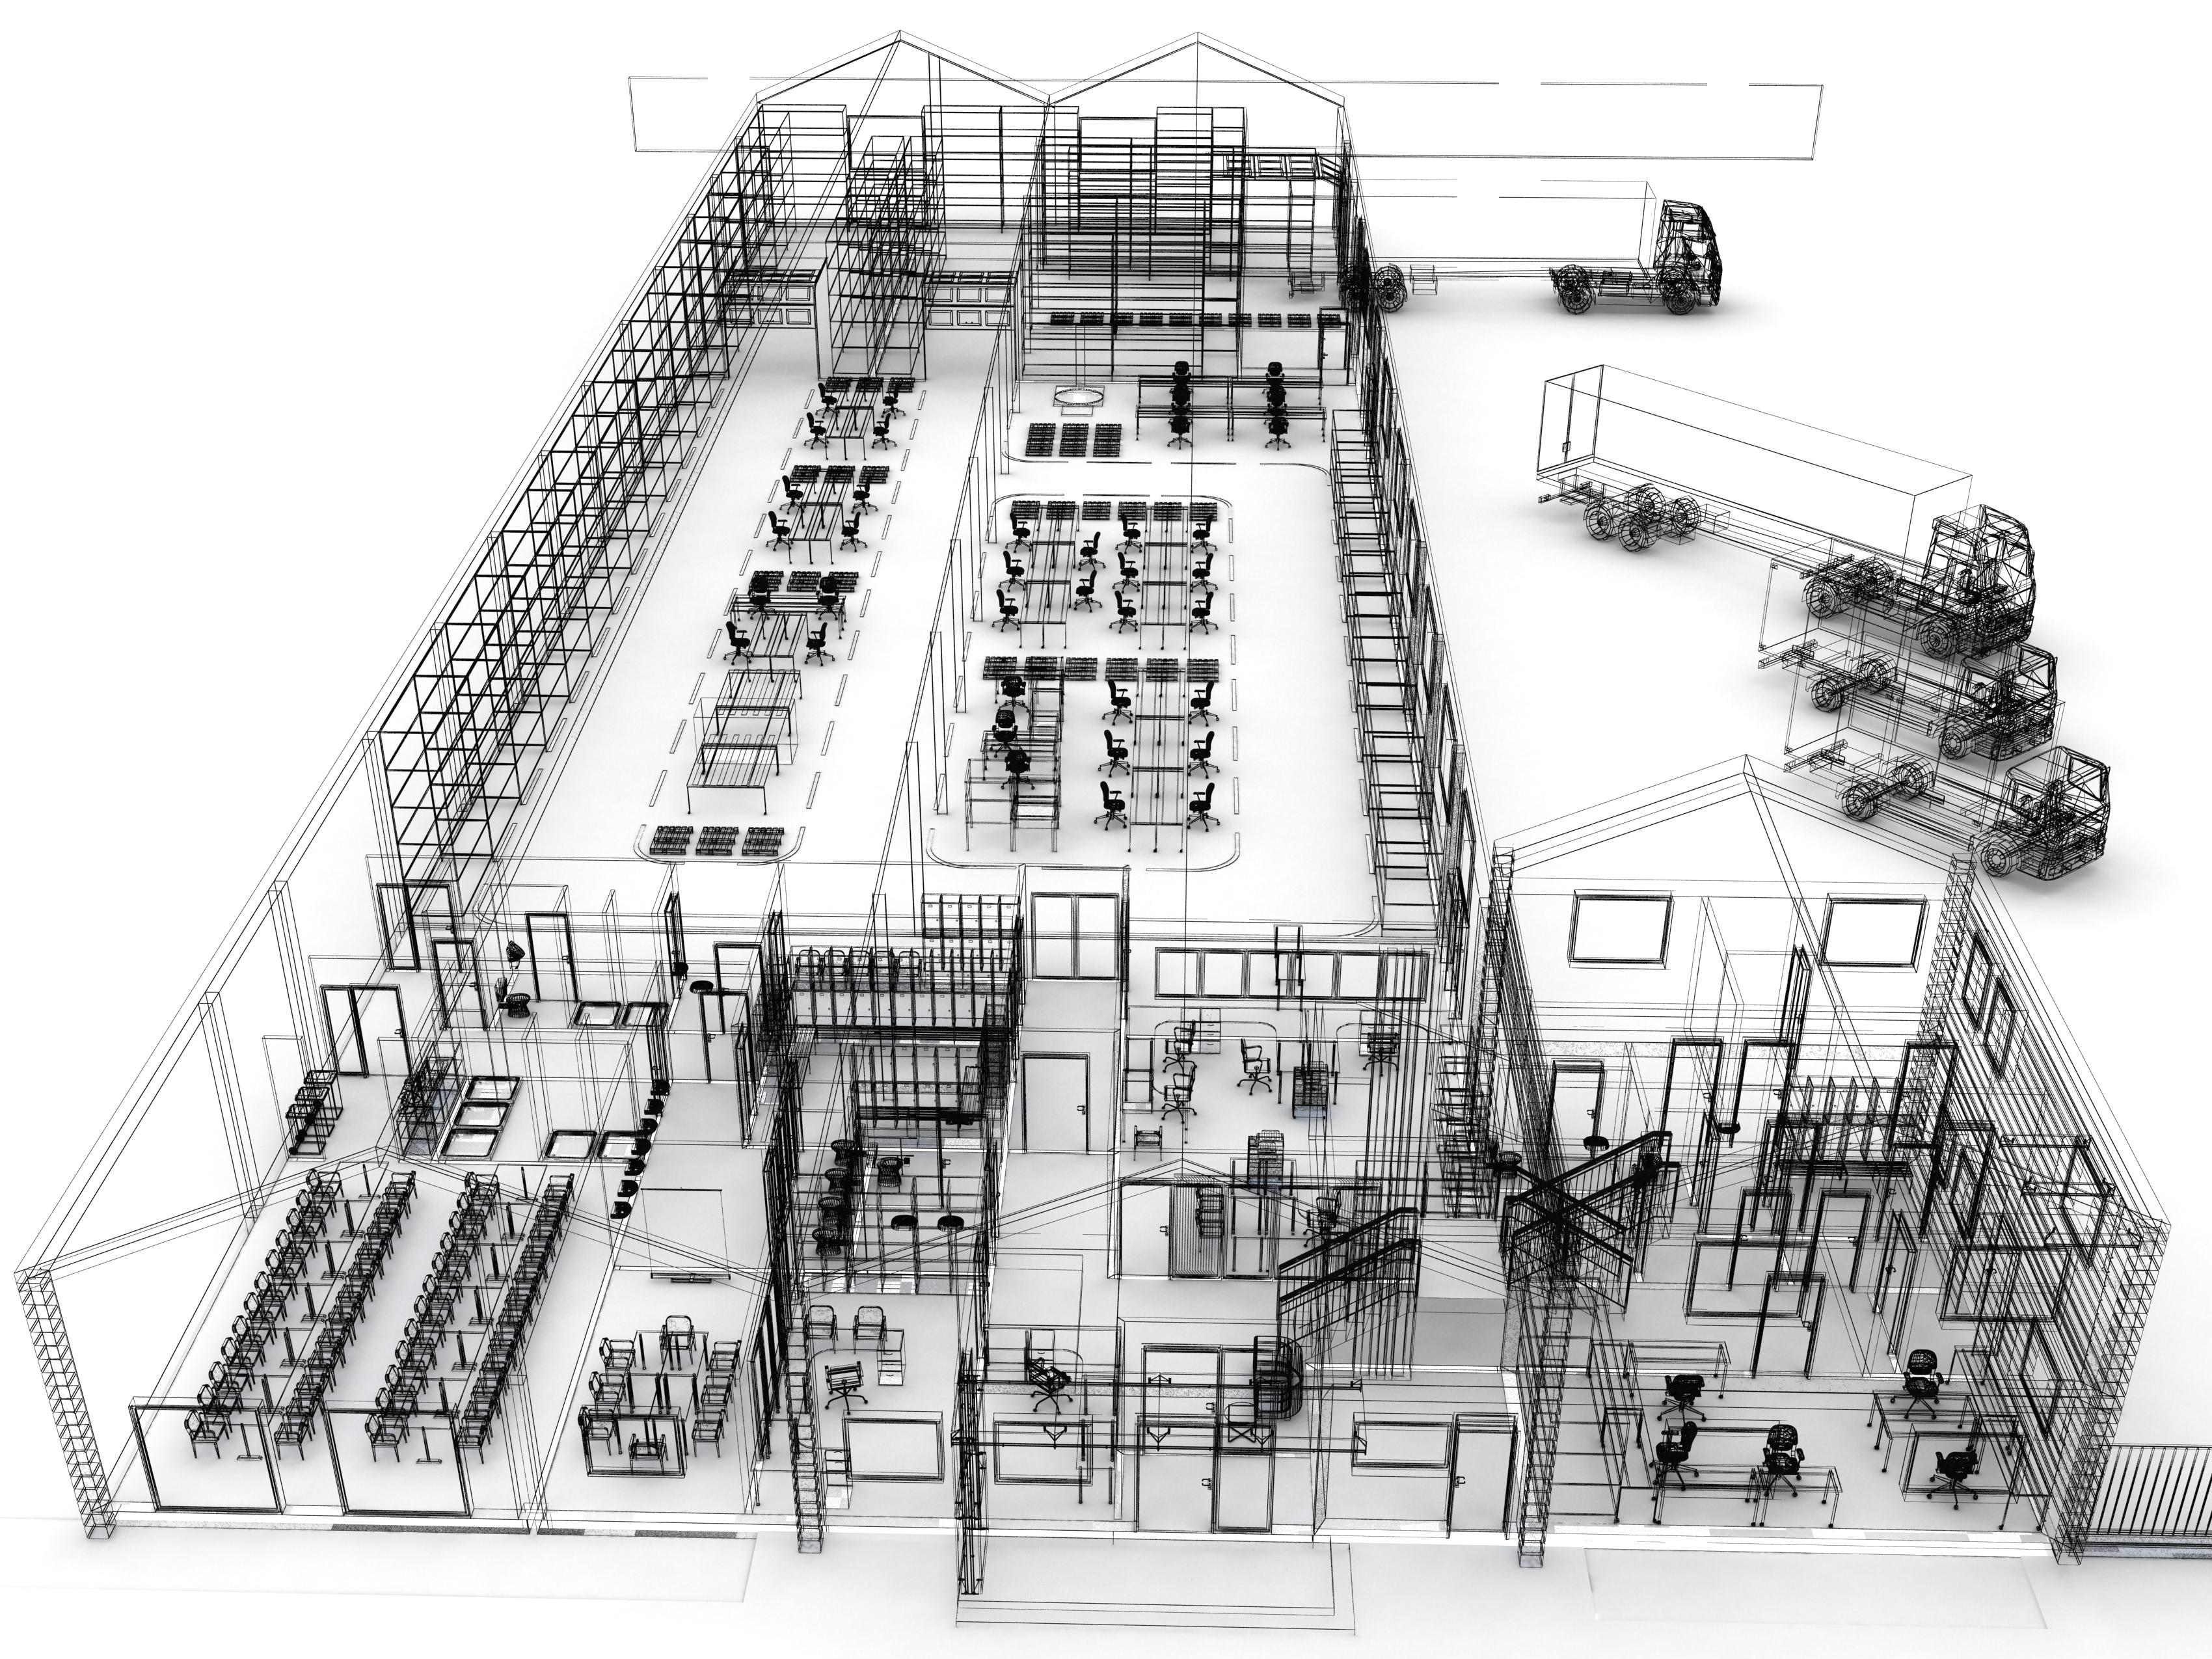 warehouse layout design illustration